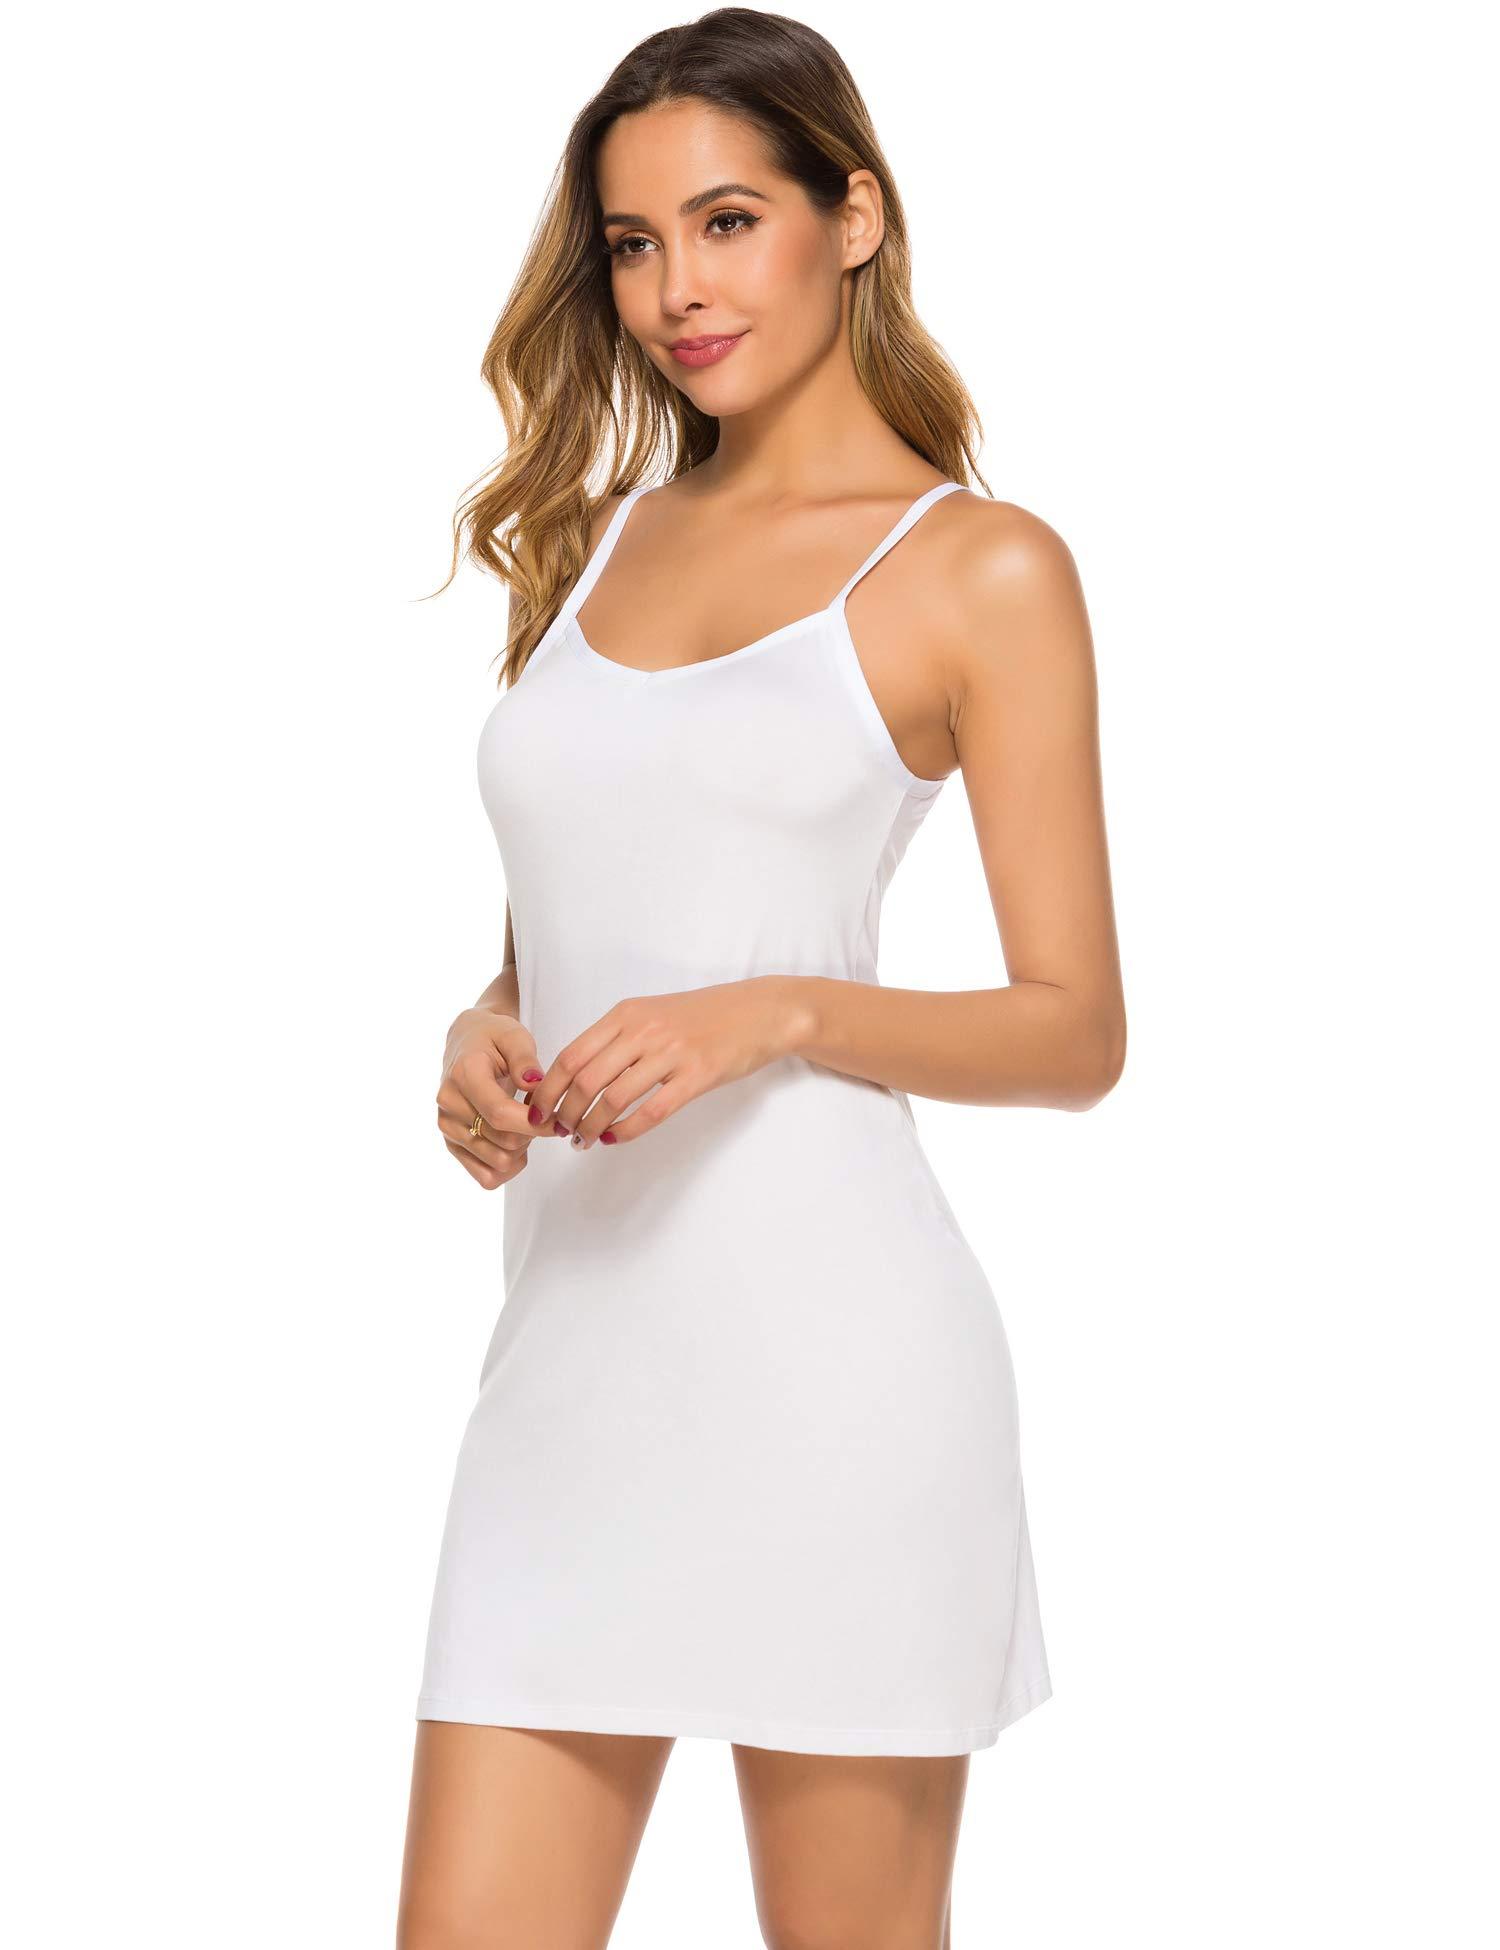 Popbee Women's Basic Slip Dress Adjustable Spaghetti Strap Cami Mini Dress